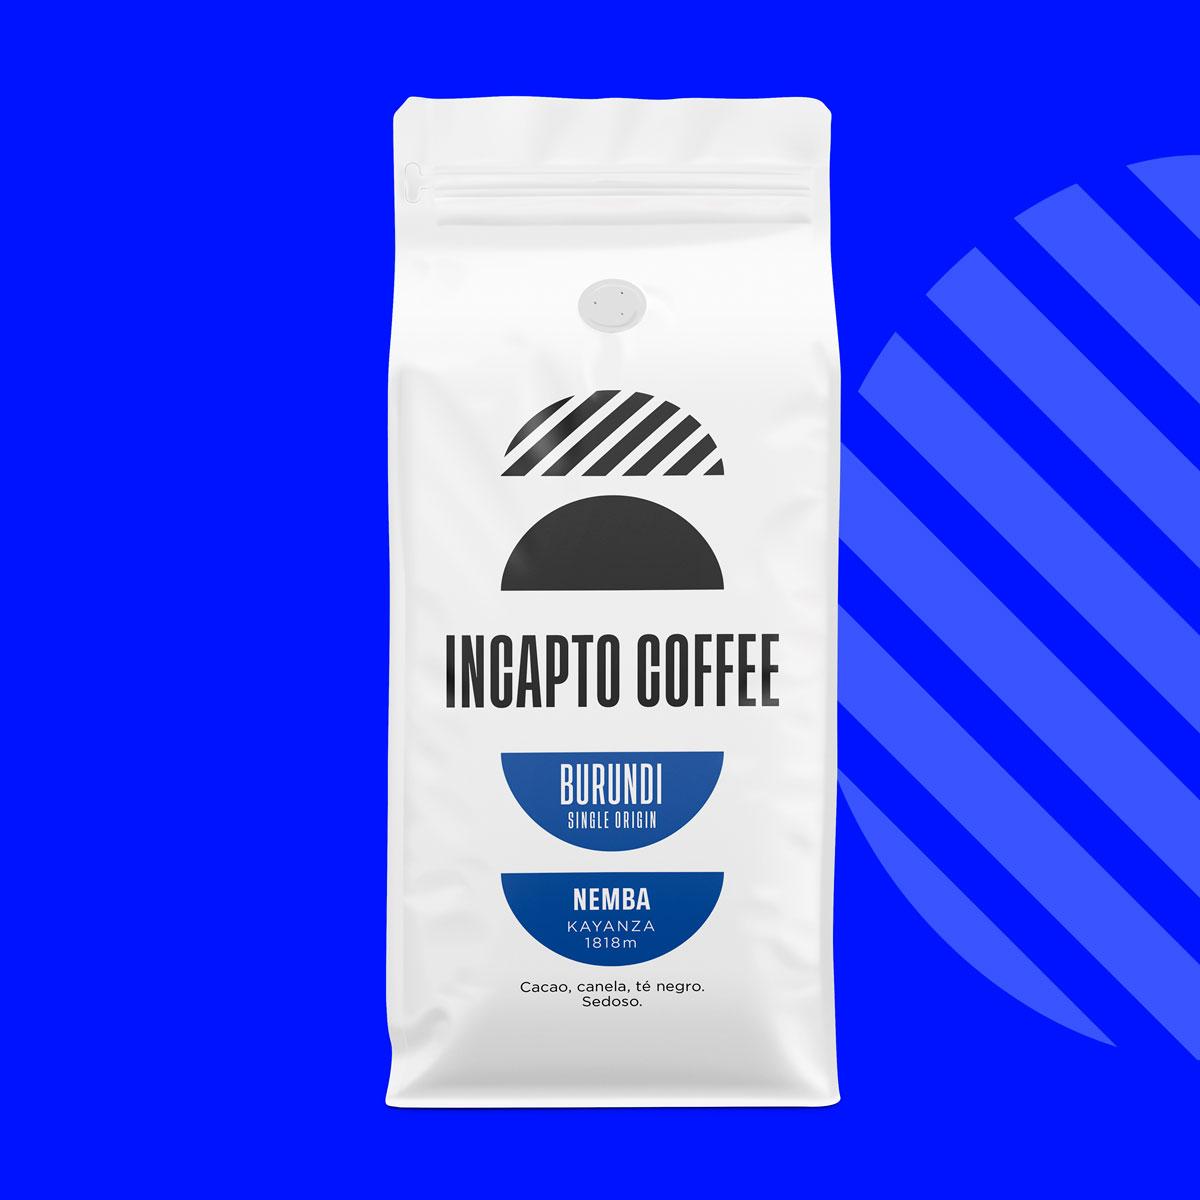 Incapto Coffee Burundi Nemba Kayanza